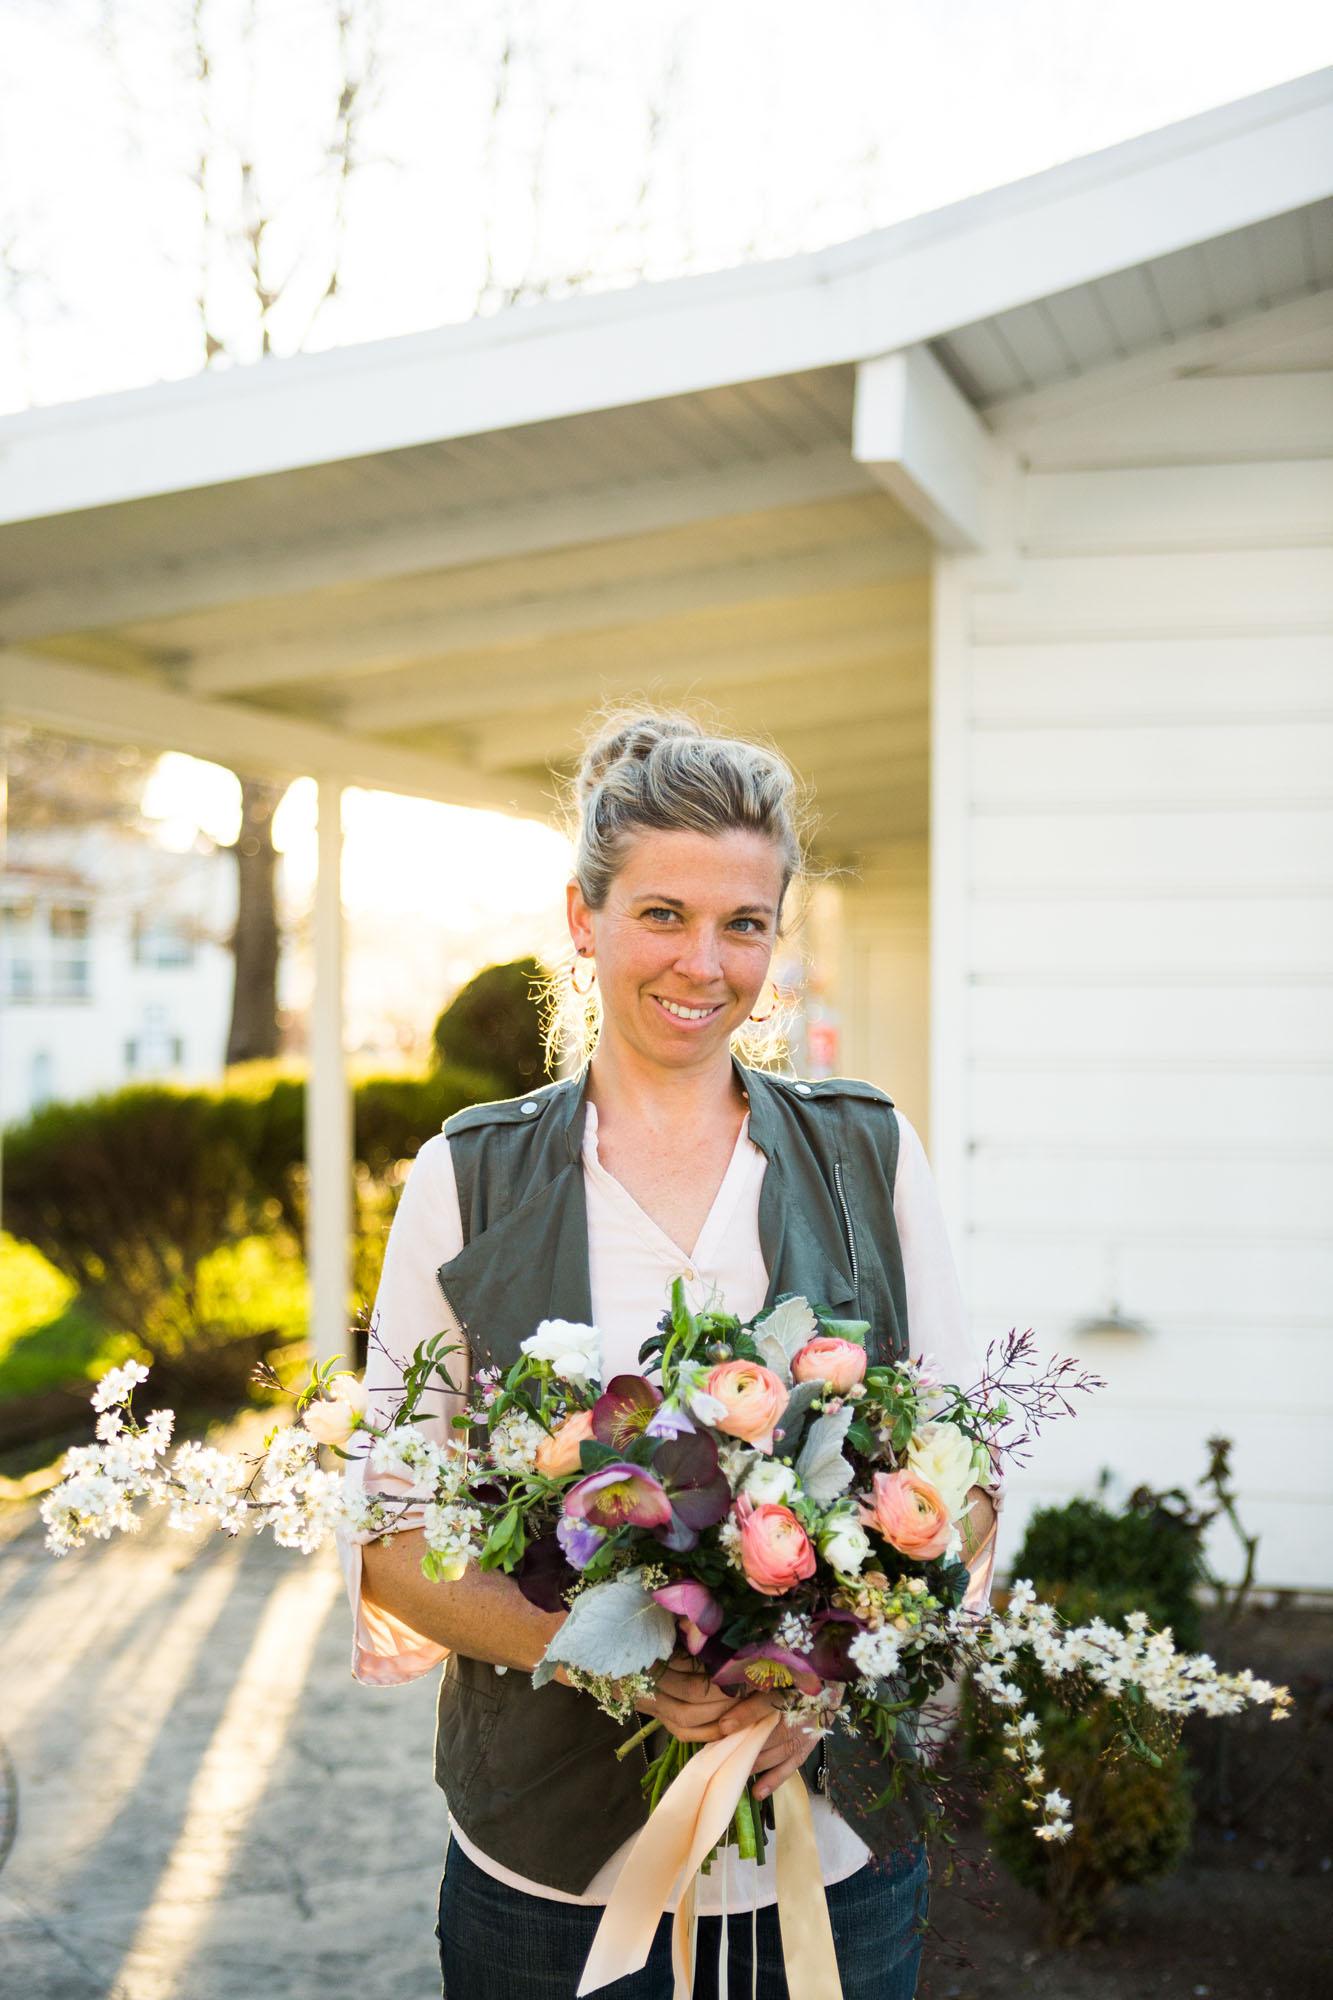 FlowersbyCarra-florist-branding.jpg